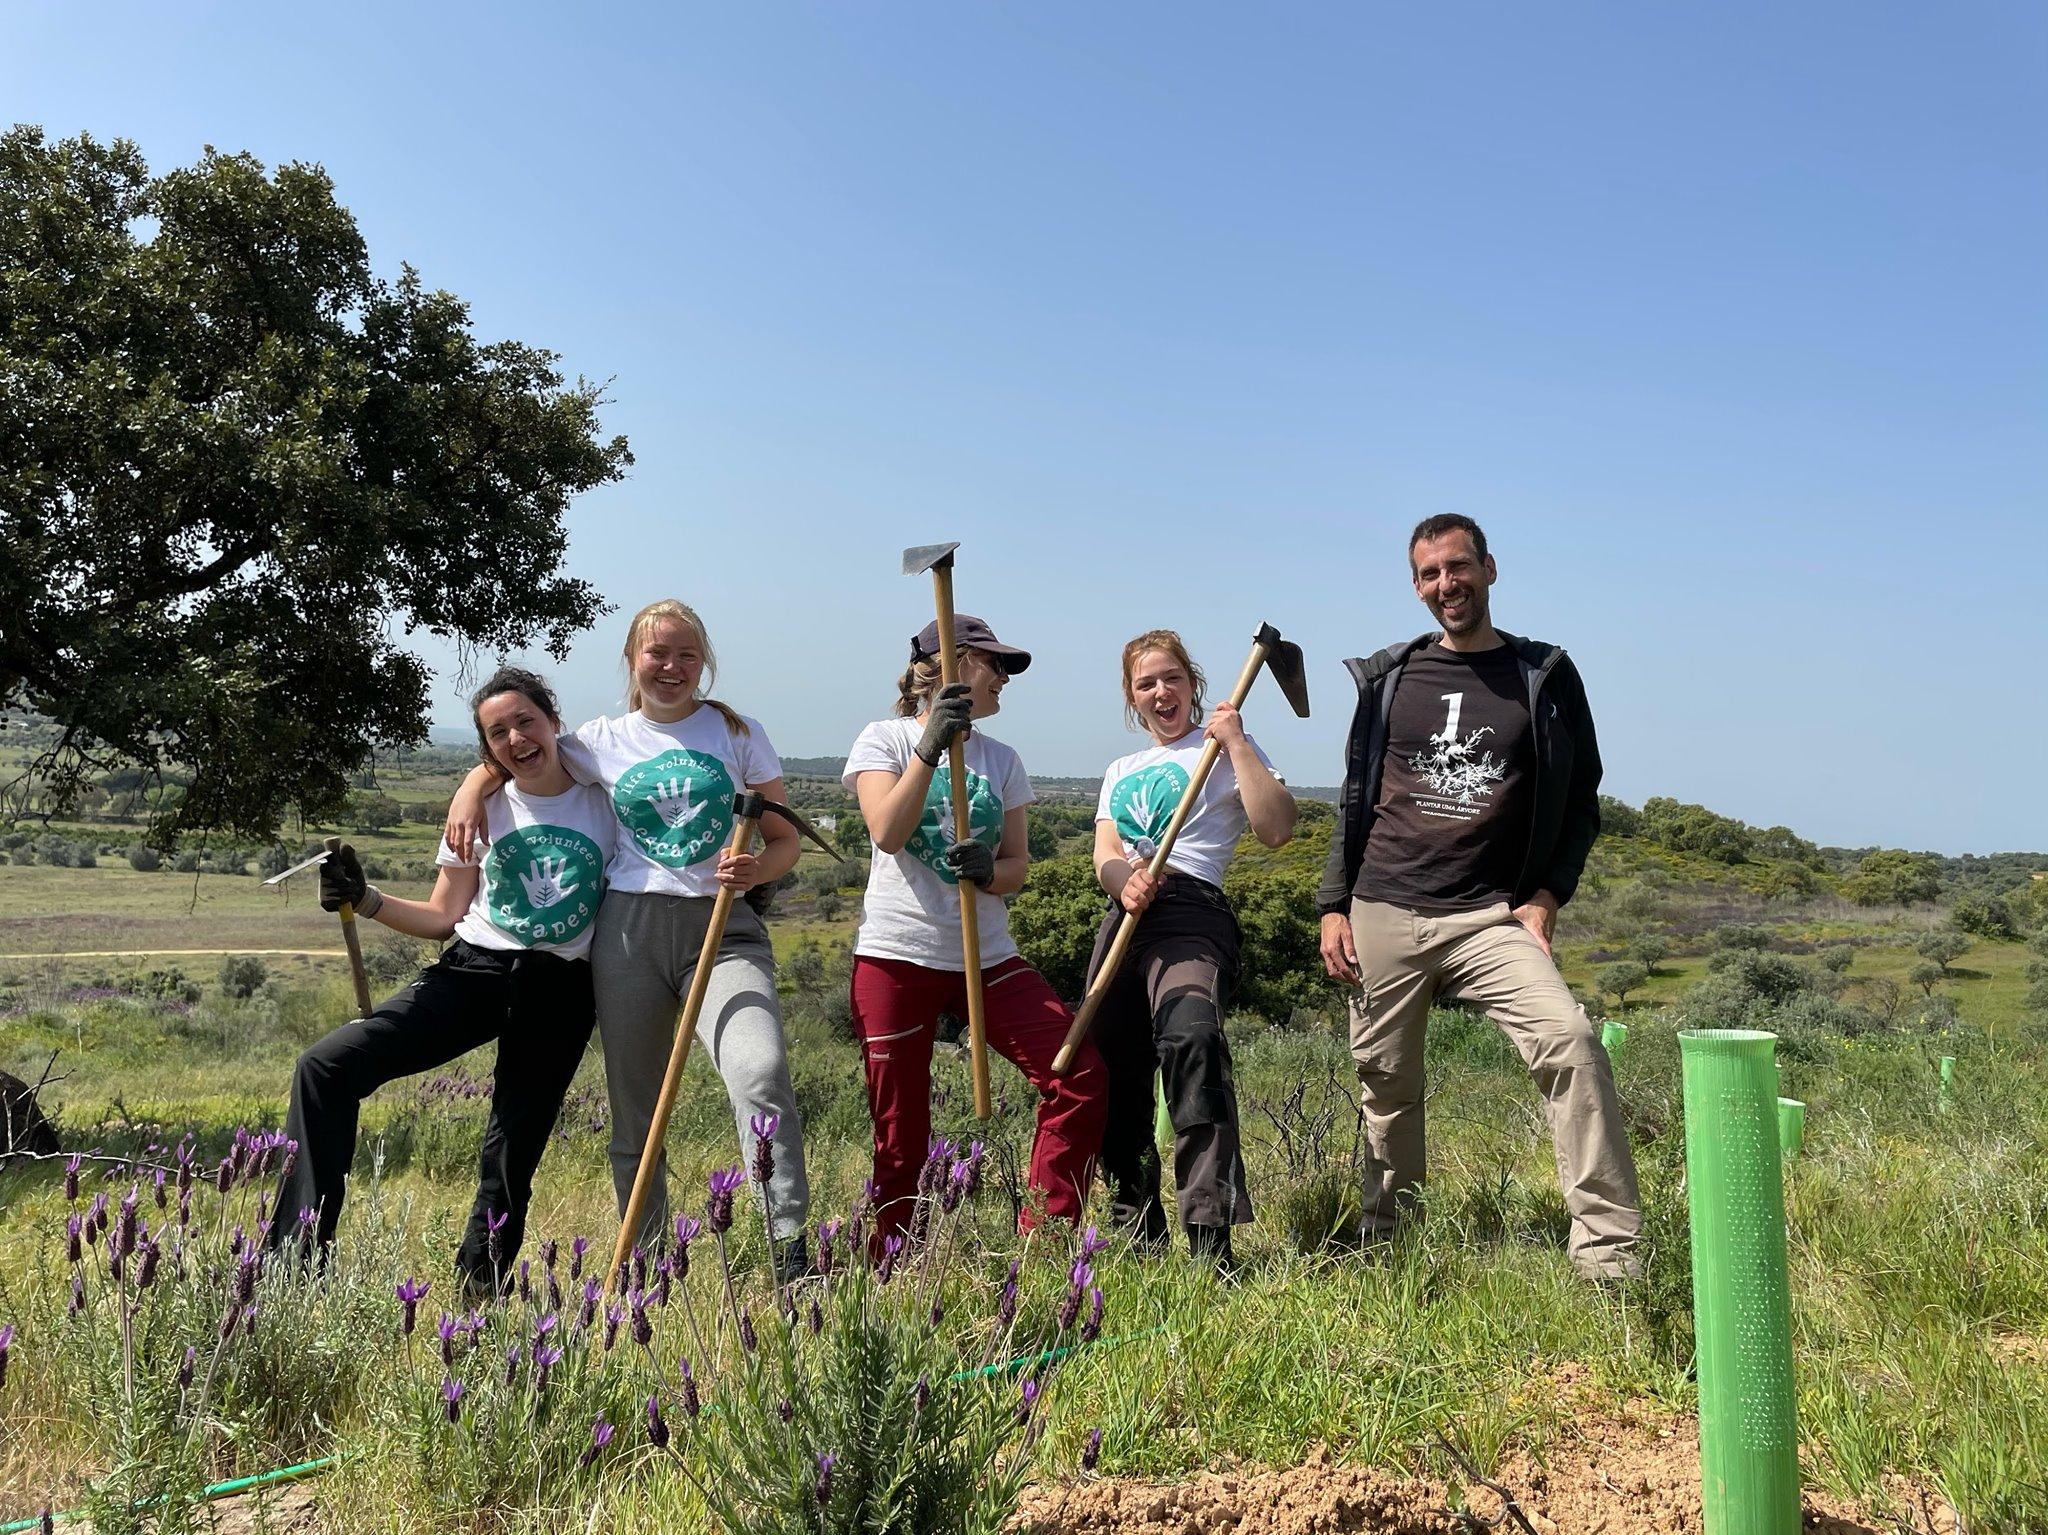 Voluntariado com Significado e Impacto